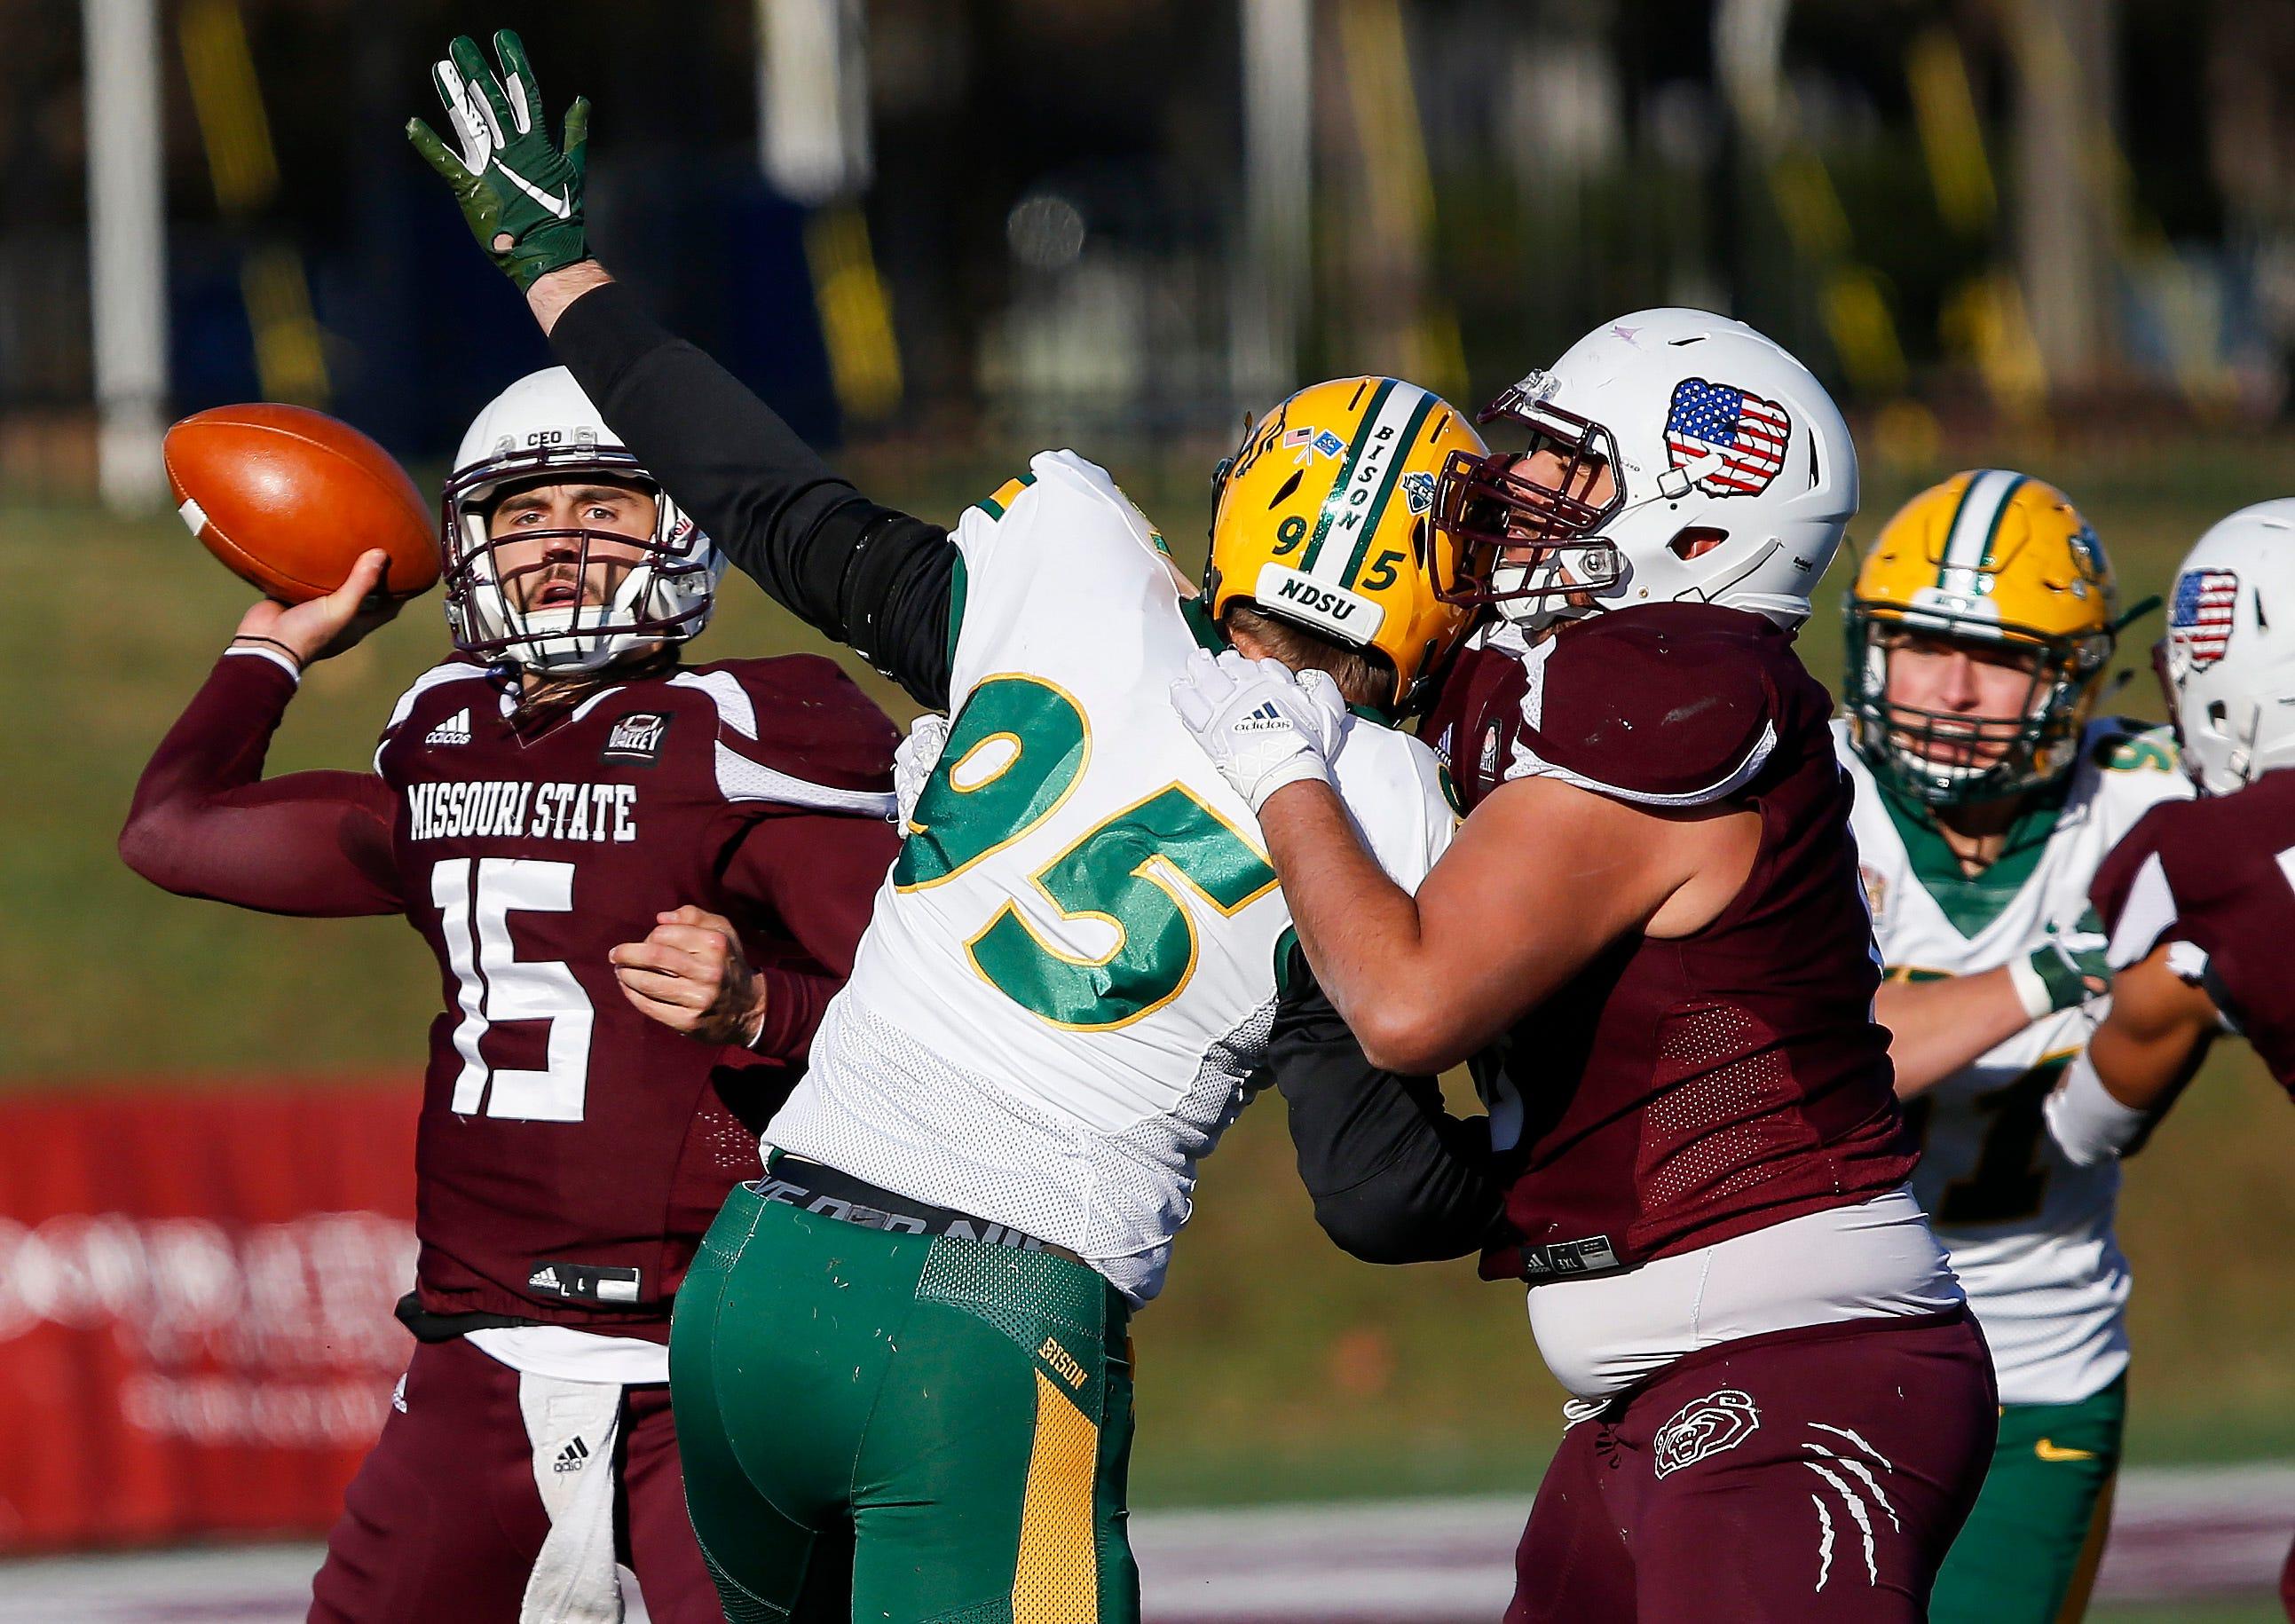 Missouri State University's Peyton Huslig passes the ball in the Bear's last home game of the season against North Dakota State at Plaster Stadium on Saturday, Nov. 10, 2018.